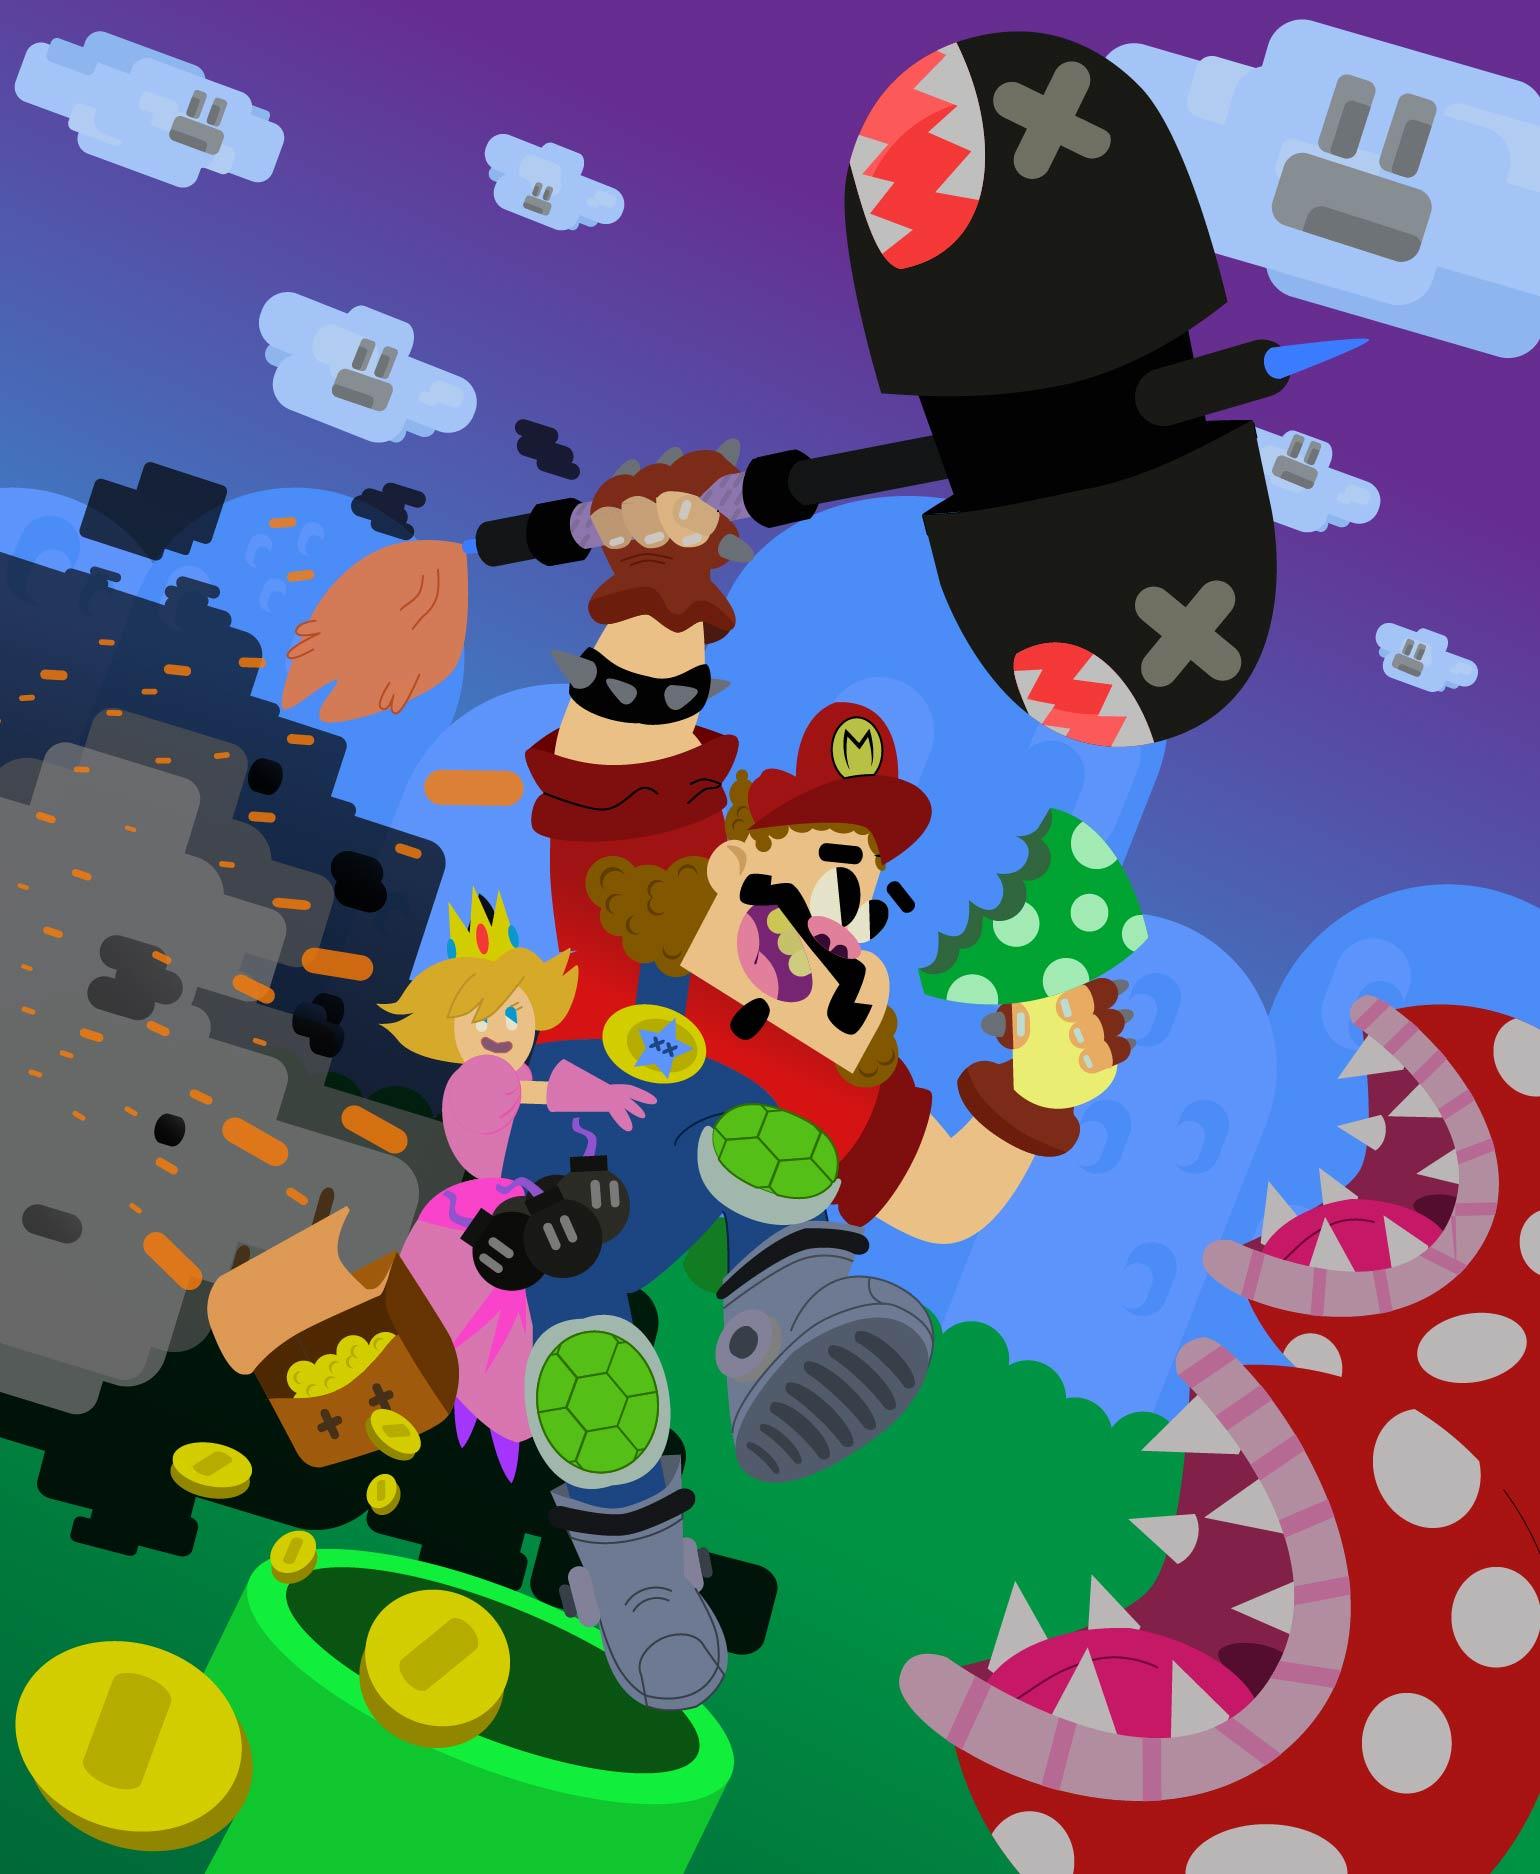 Mario the Turtle Slayer